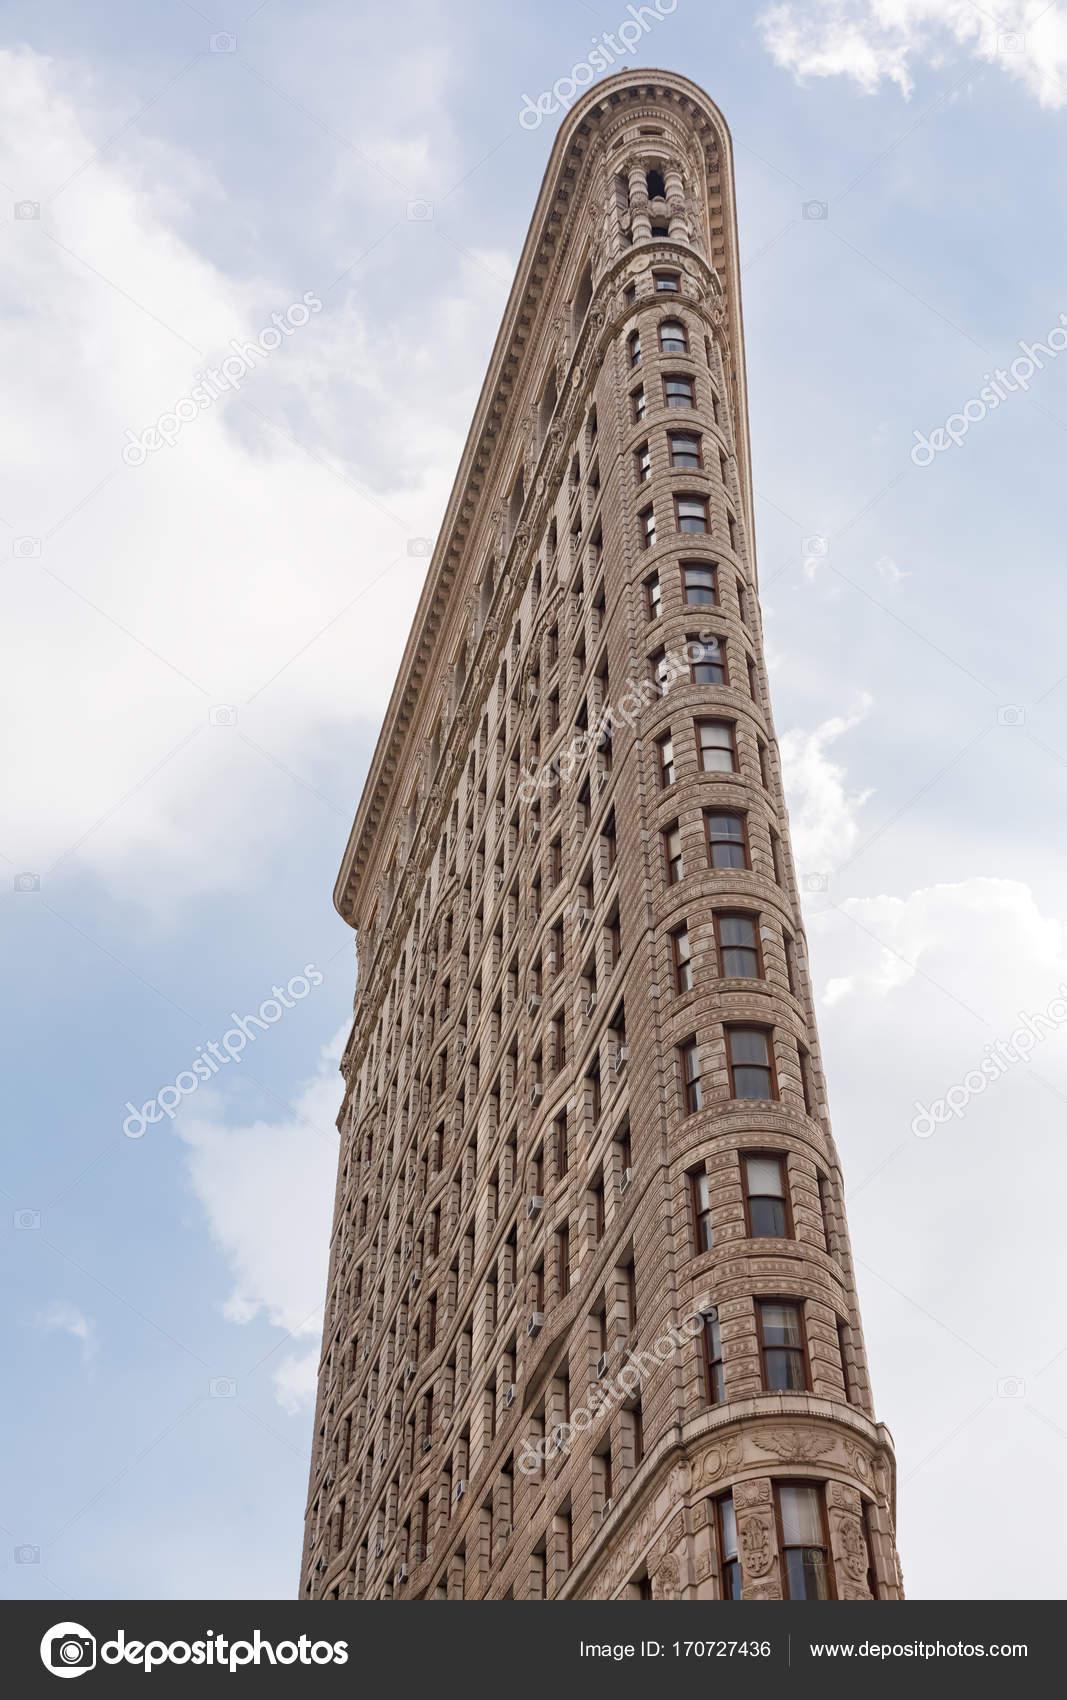 Flatiron Building in New York City — Redaktionelles Stockfoto ...